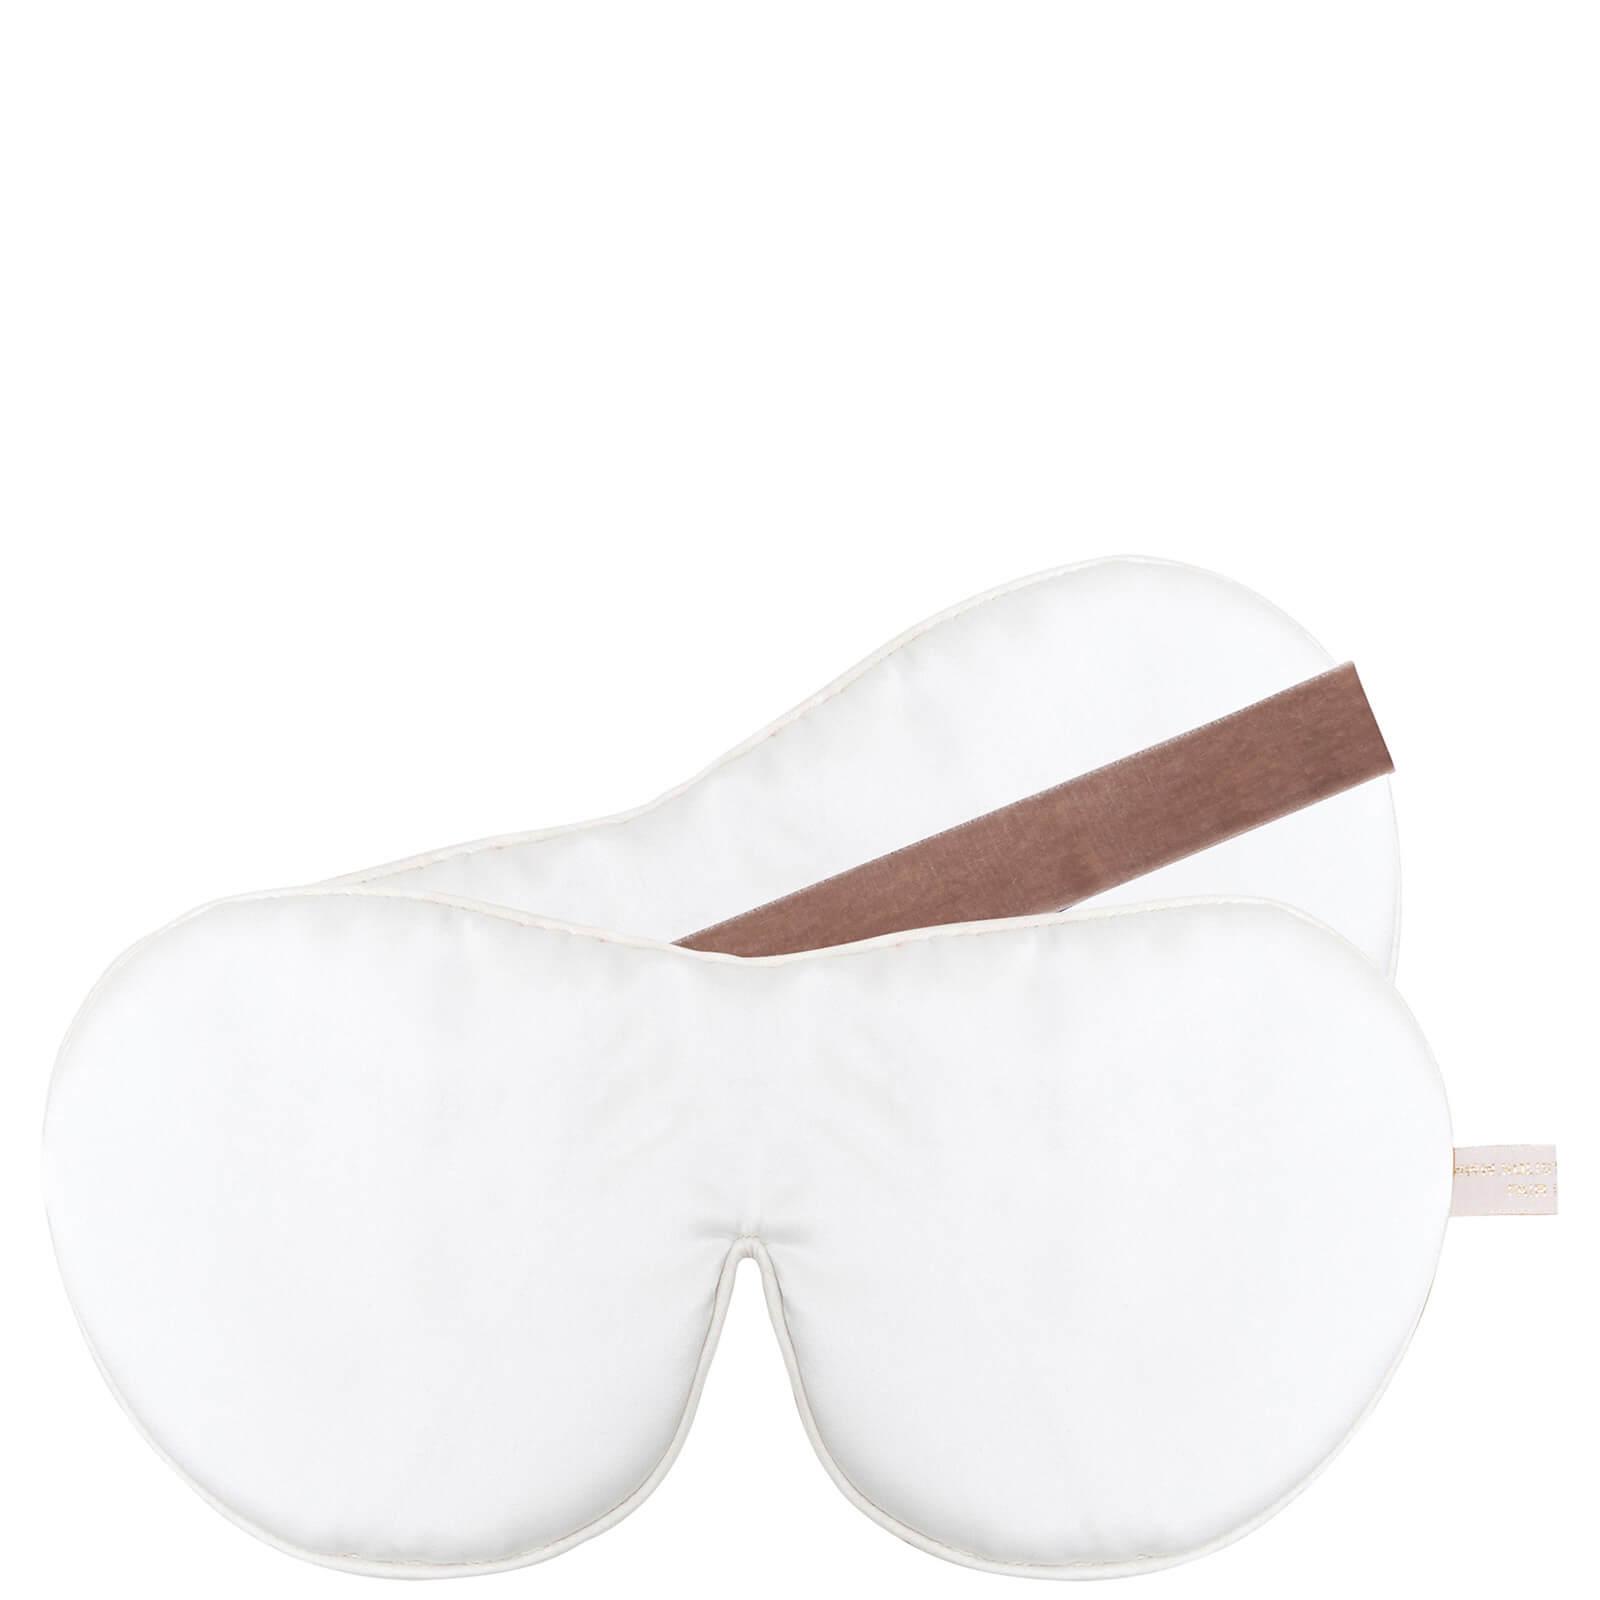 Купить Тканевая маска для глаз против признаков старения Holistic Silk One Strap Pure Silk Anti-Ageing Eye Mask — белая